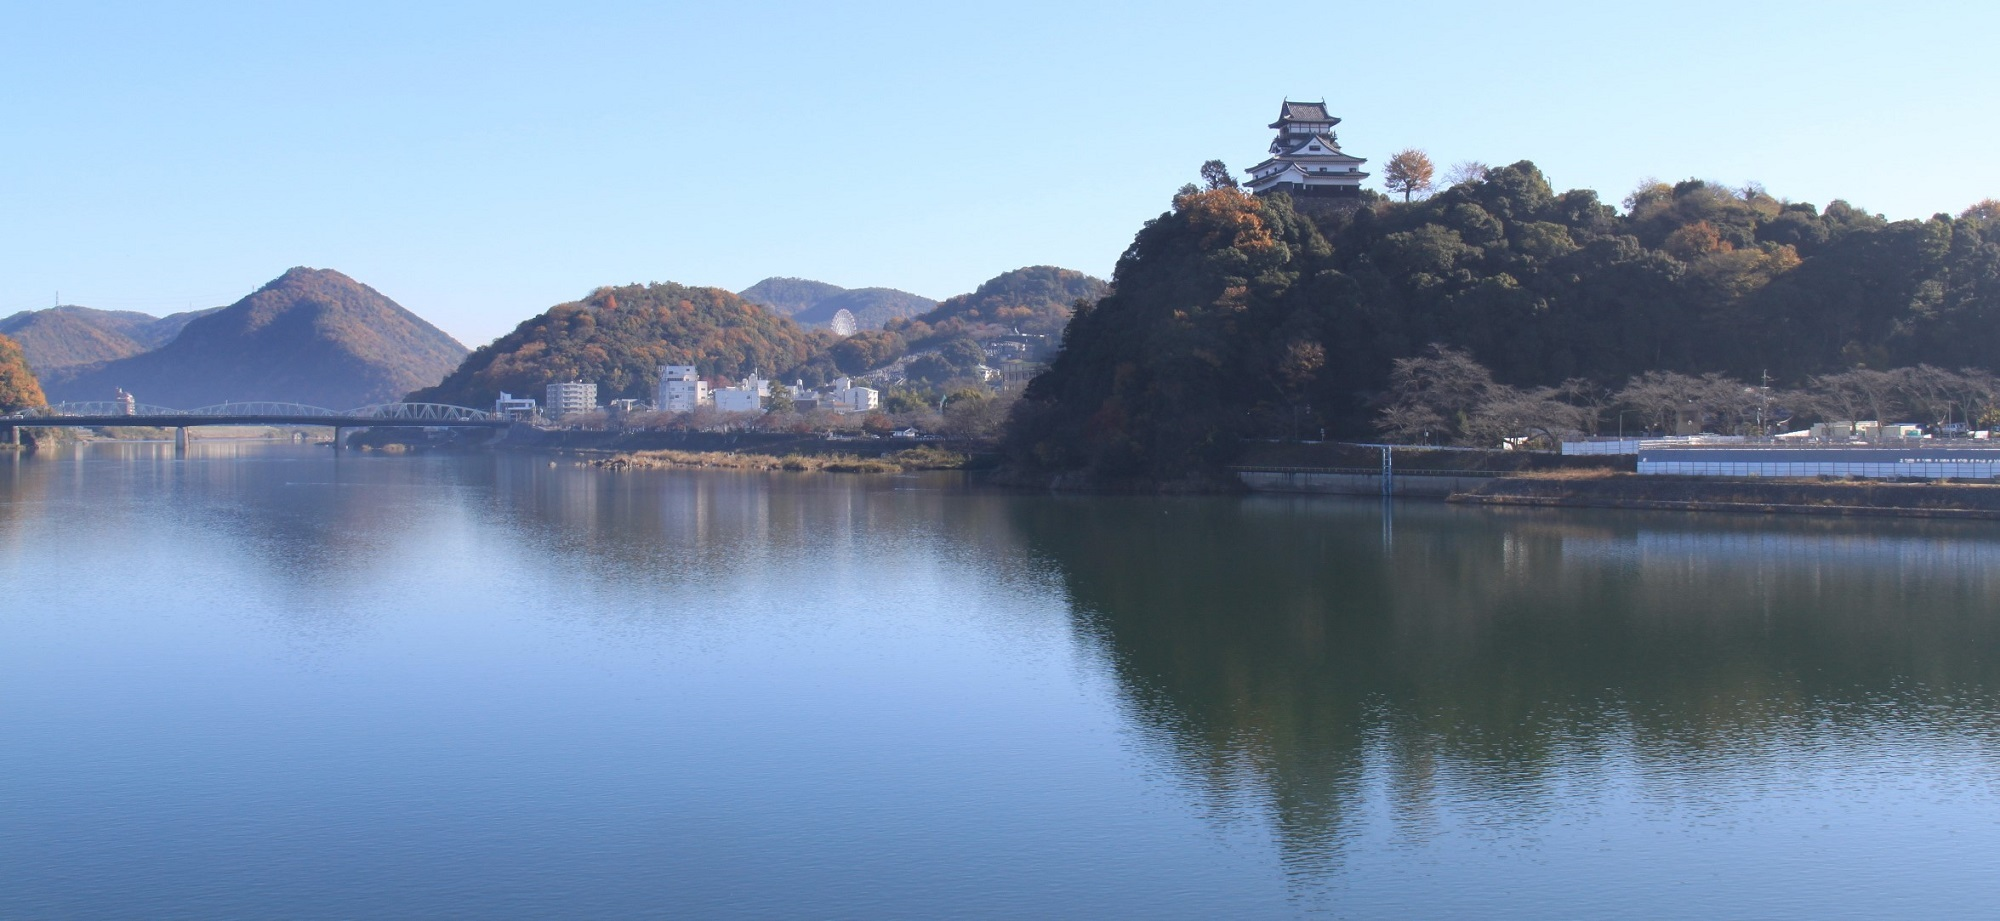 inuyama (3)